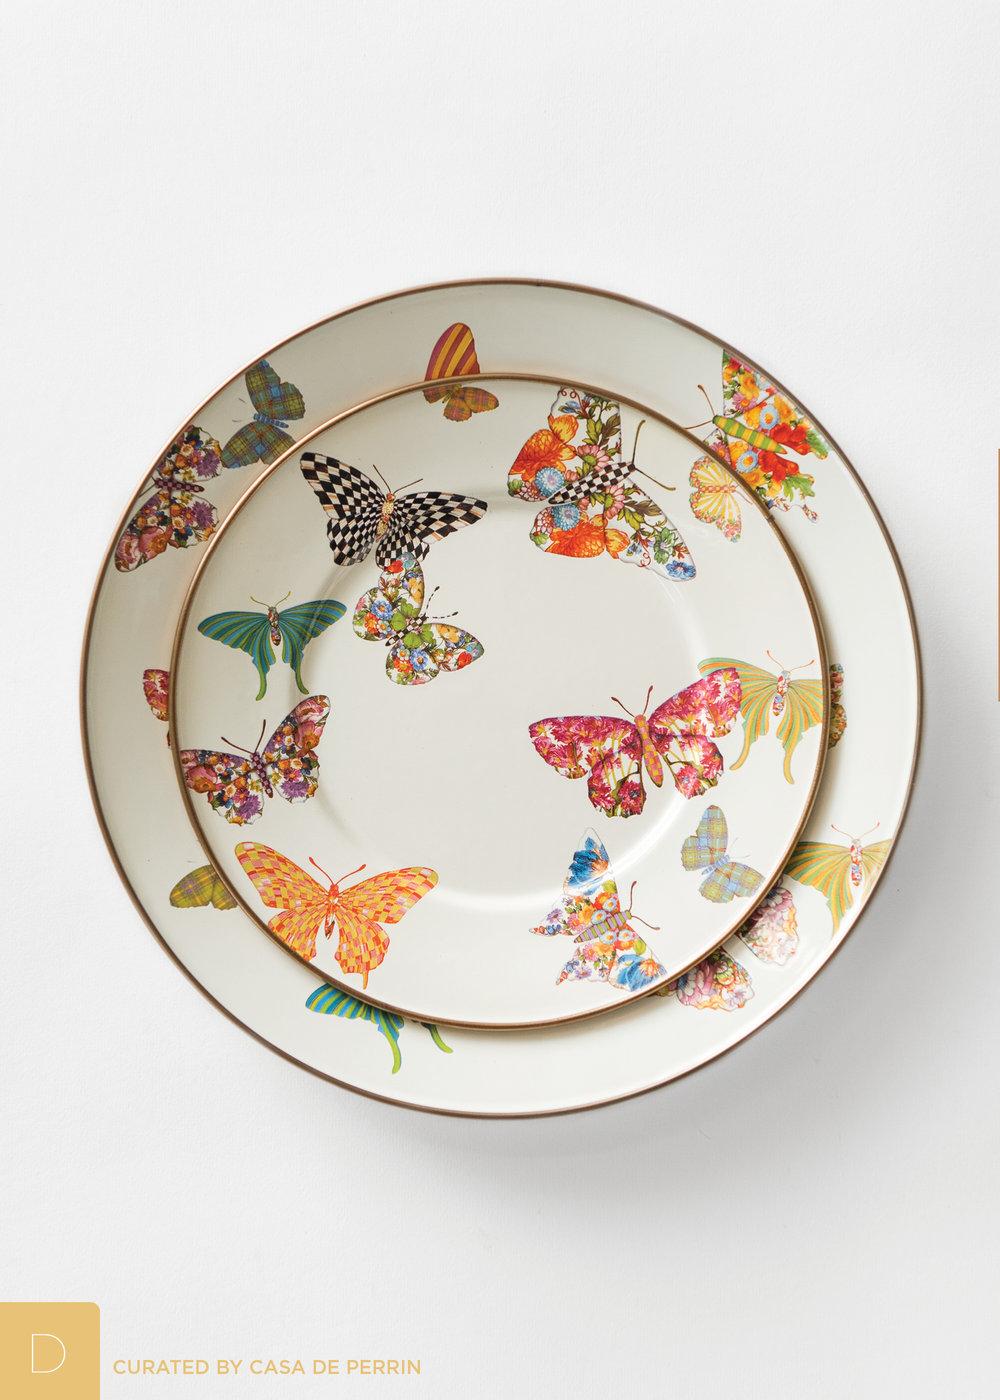 Mackenzie-childs | Butterfly Garden & Mackenzie-childs | Butterfly Garden u2014 Casa de Perrin